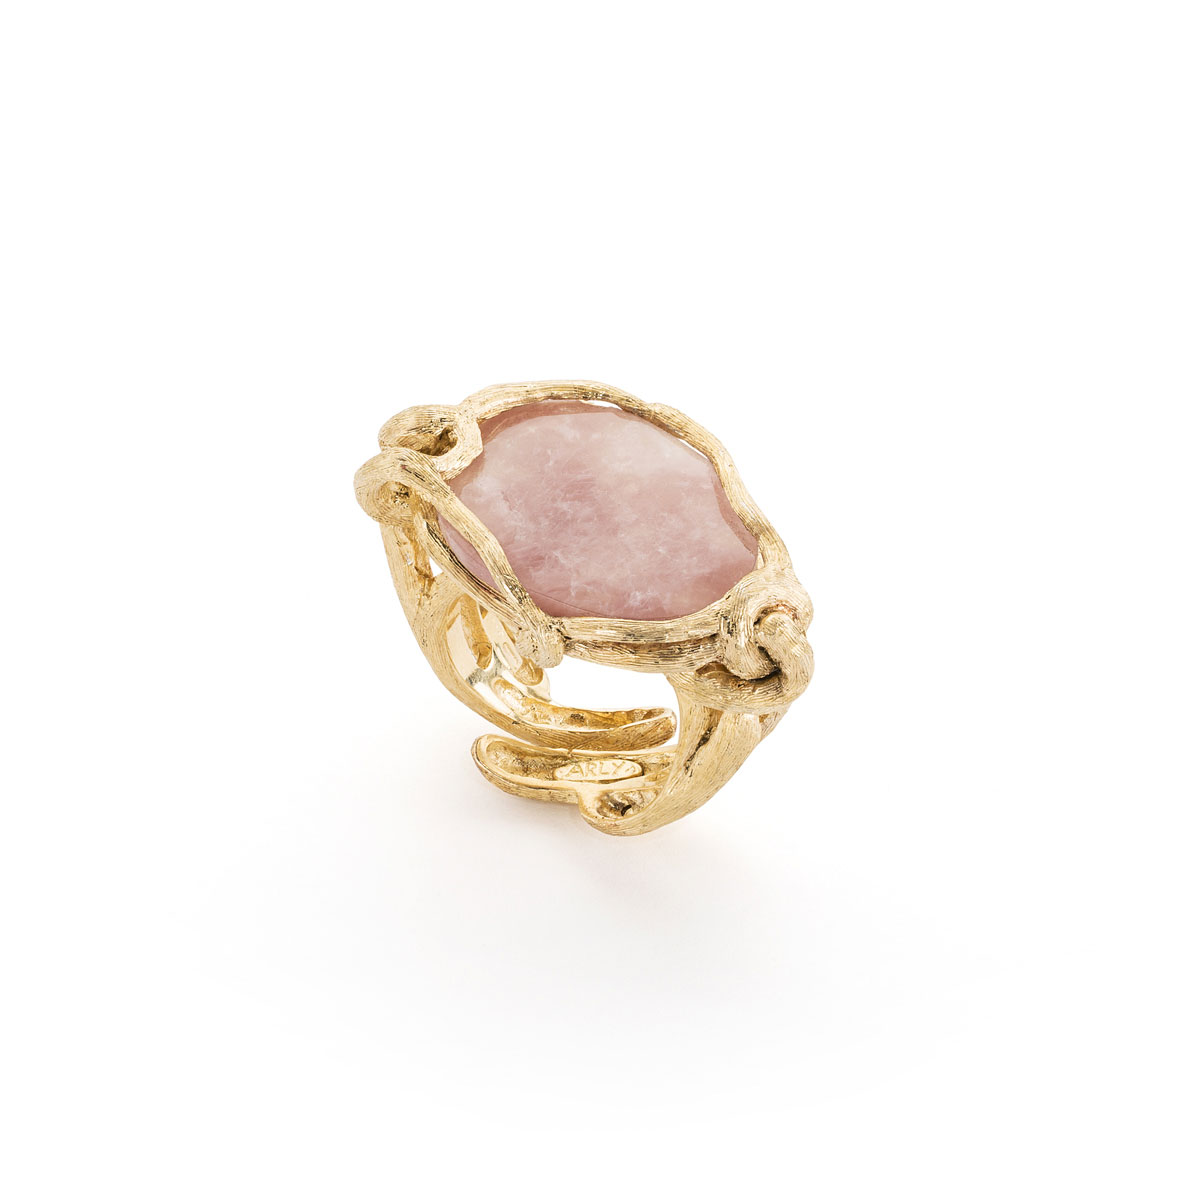 arly-goldsmith-handmade-jewellery-monticello-conte-otto-vicenza-thumbnail